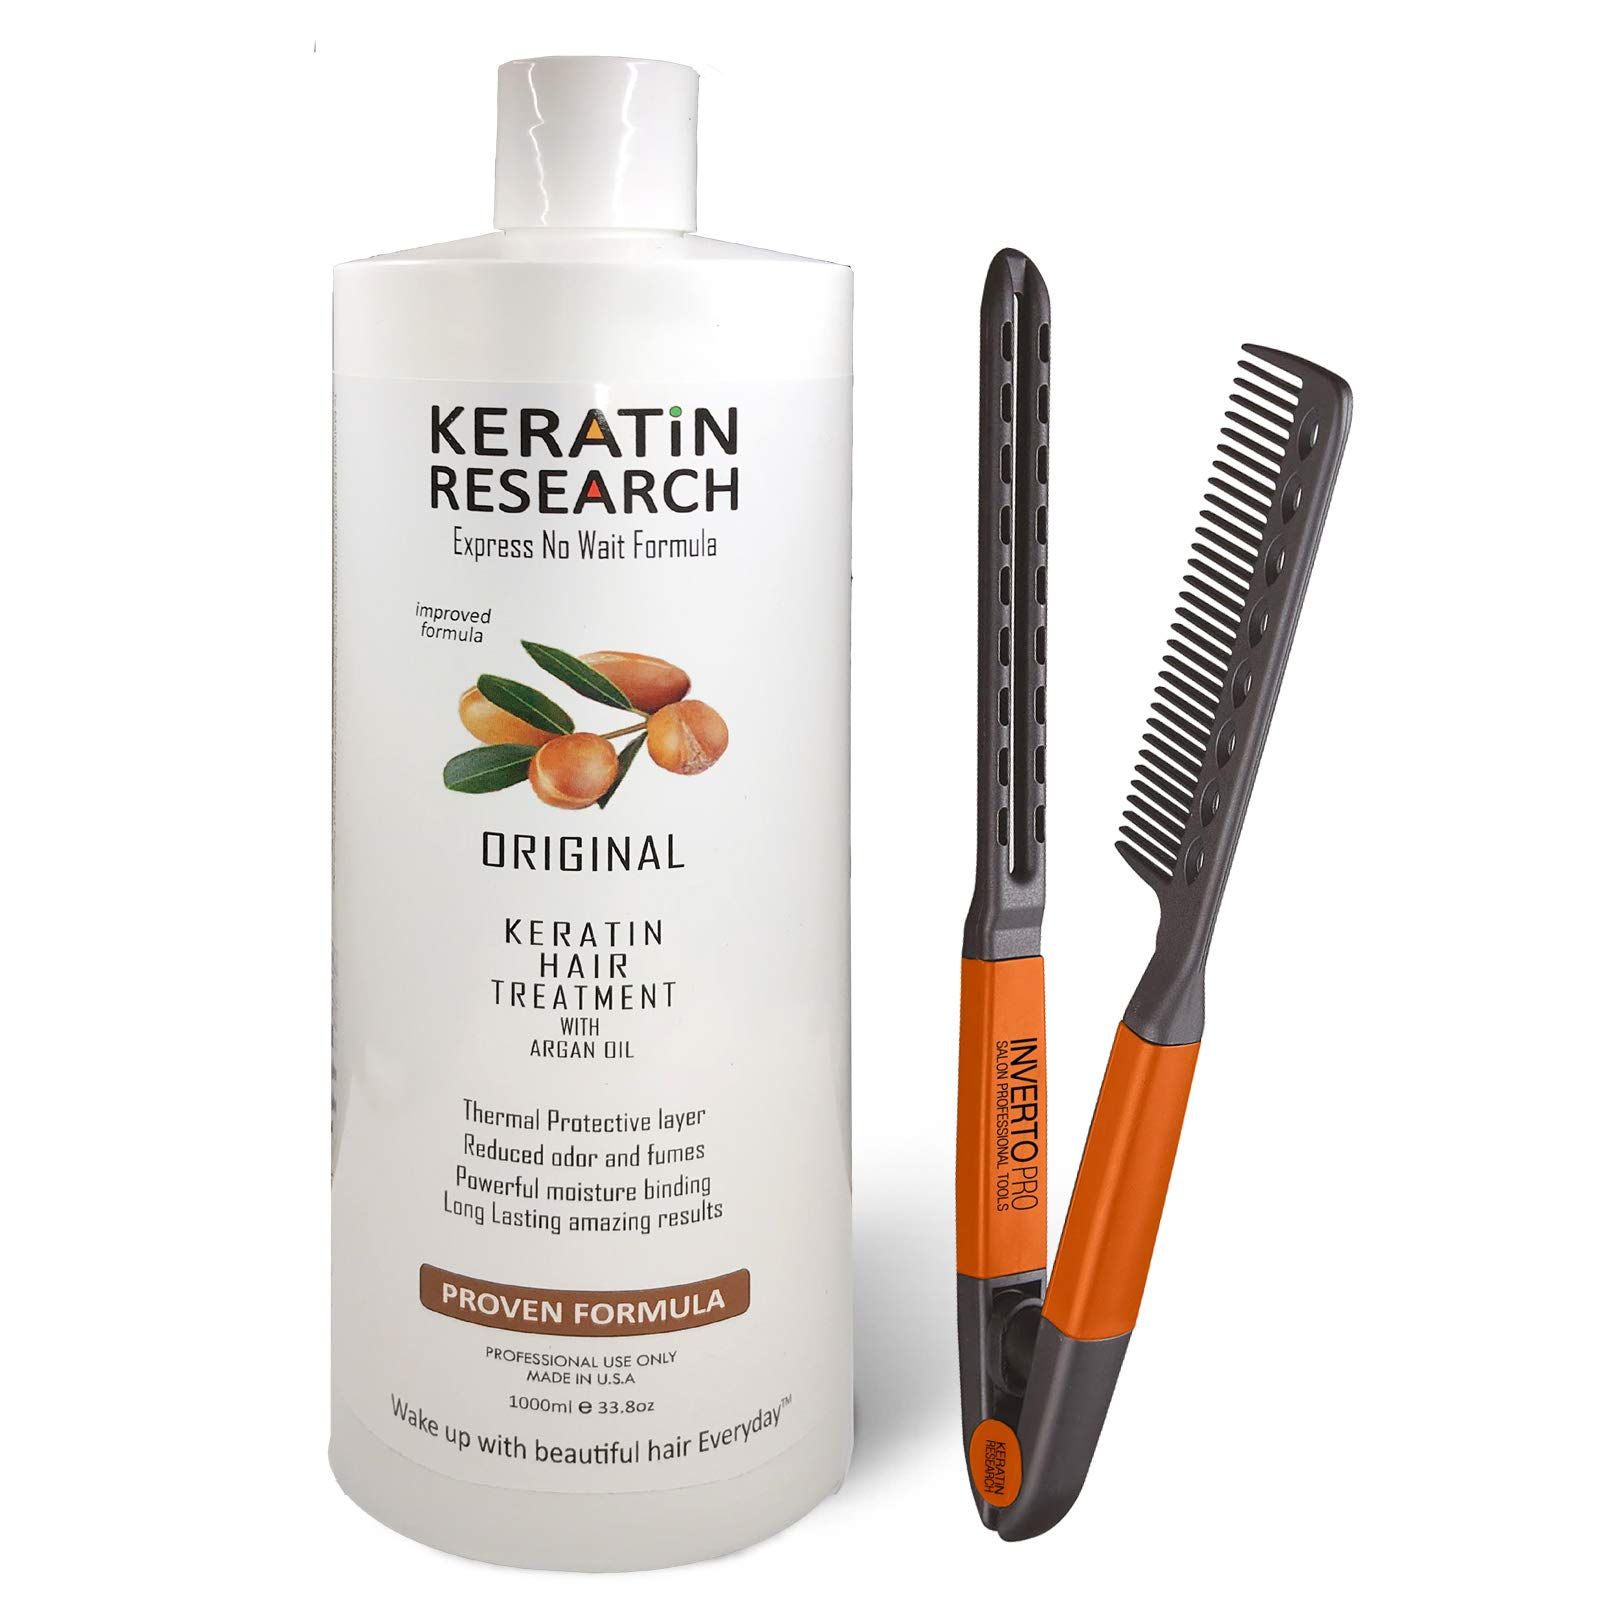 Brazilian Keratin Hair Treatment Professional X Large 1000ml Bottle Proven Amazing Results